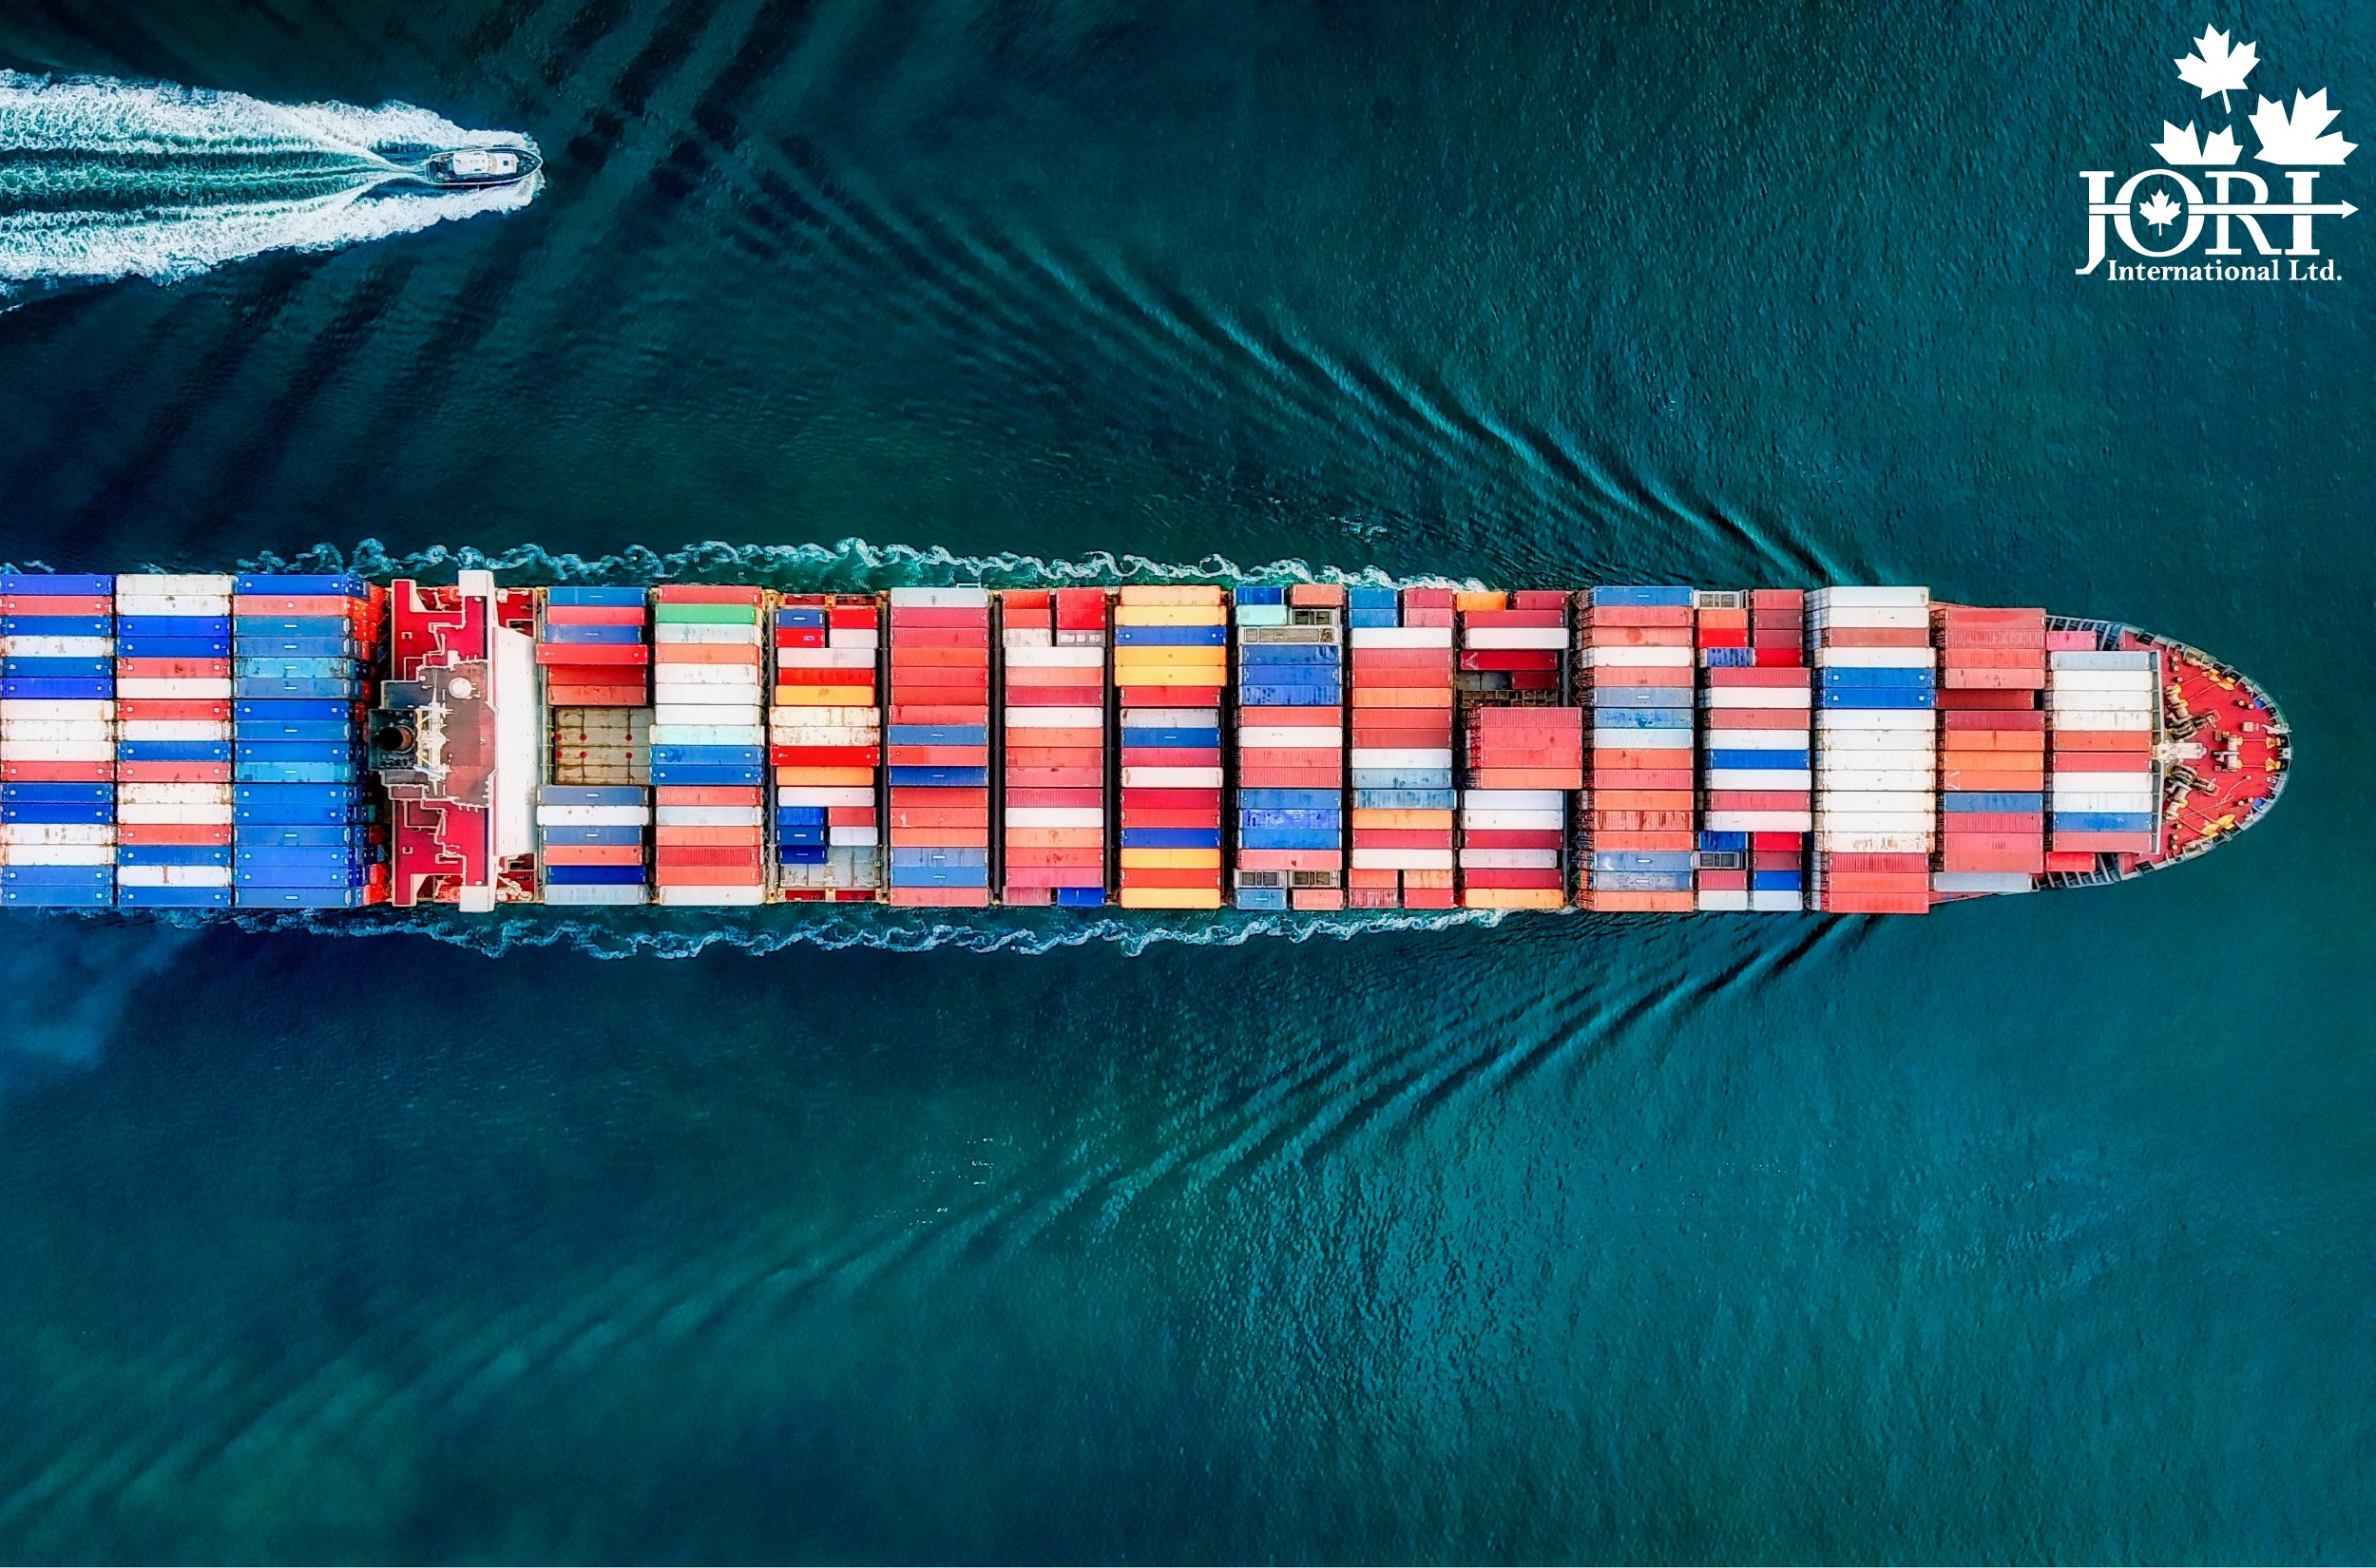 exporting-cargo-ship.jpg